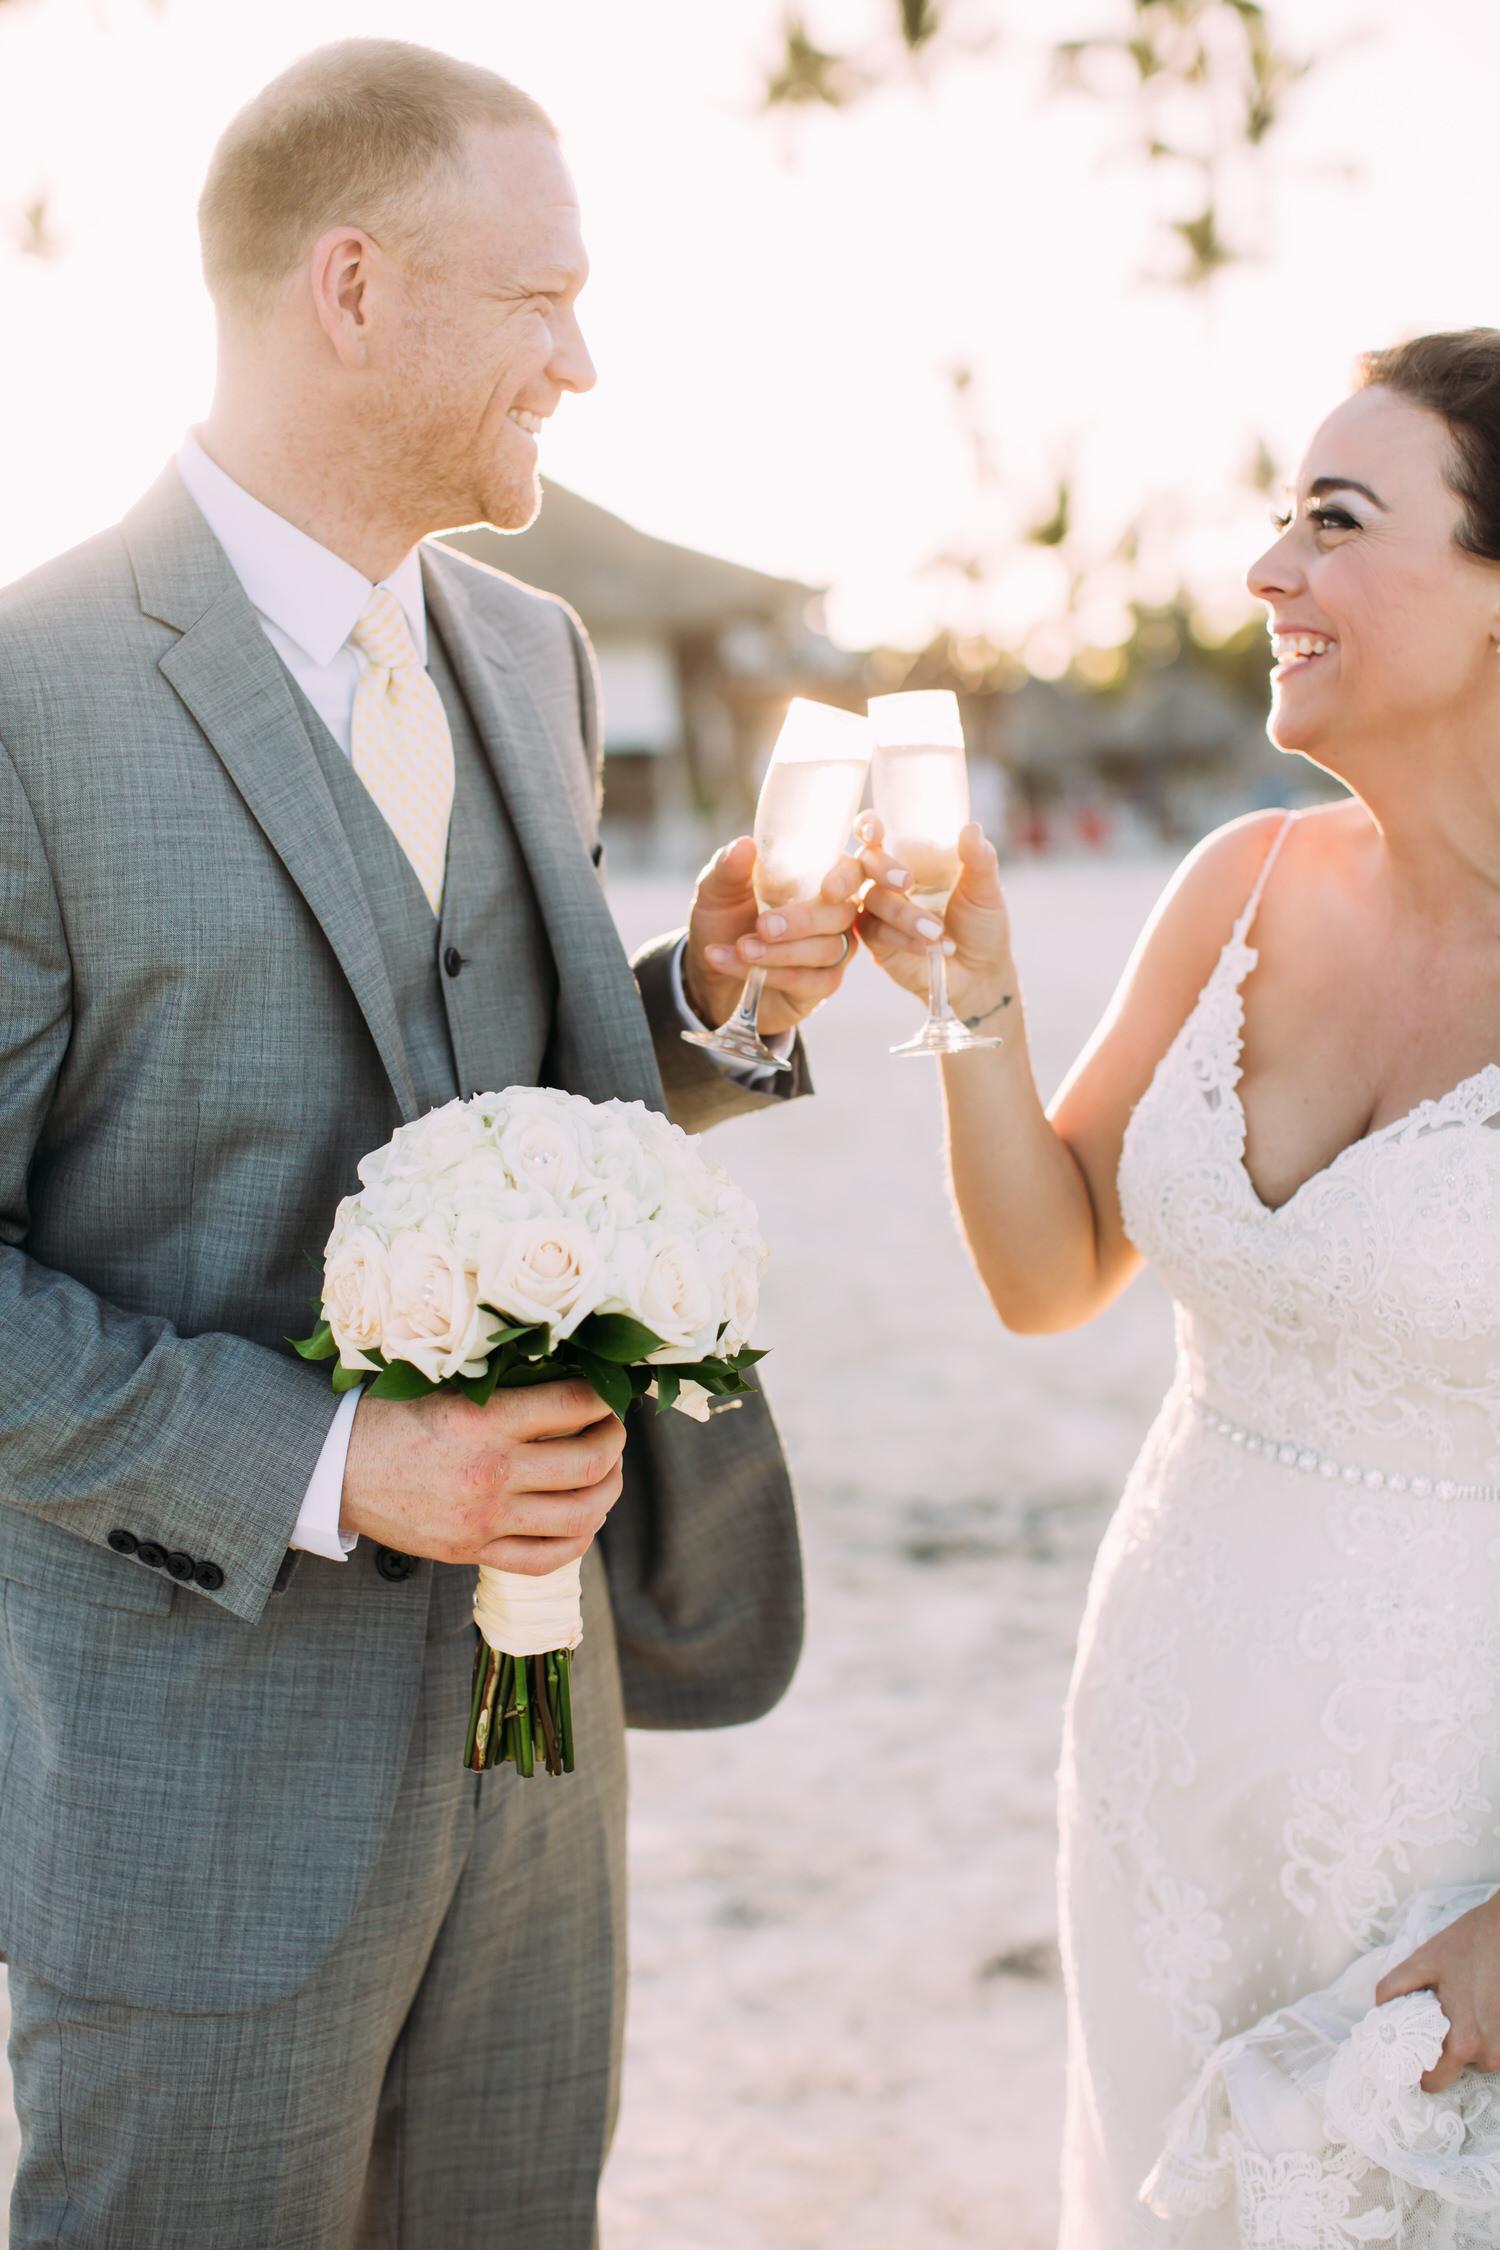 Dominican republic Wedding, Punta Cana. Destination wedding photographer. Bride and groom.